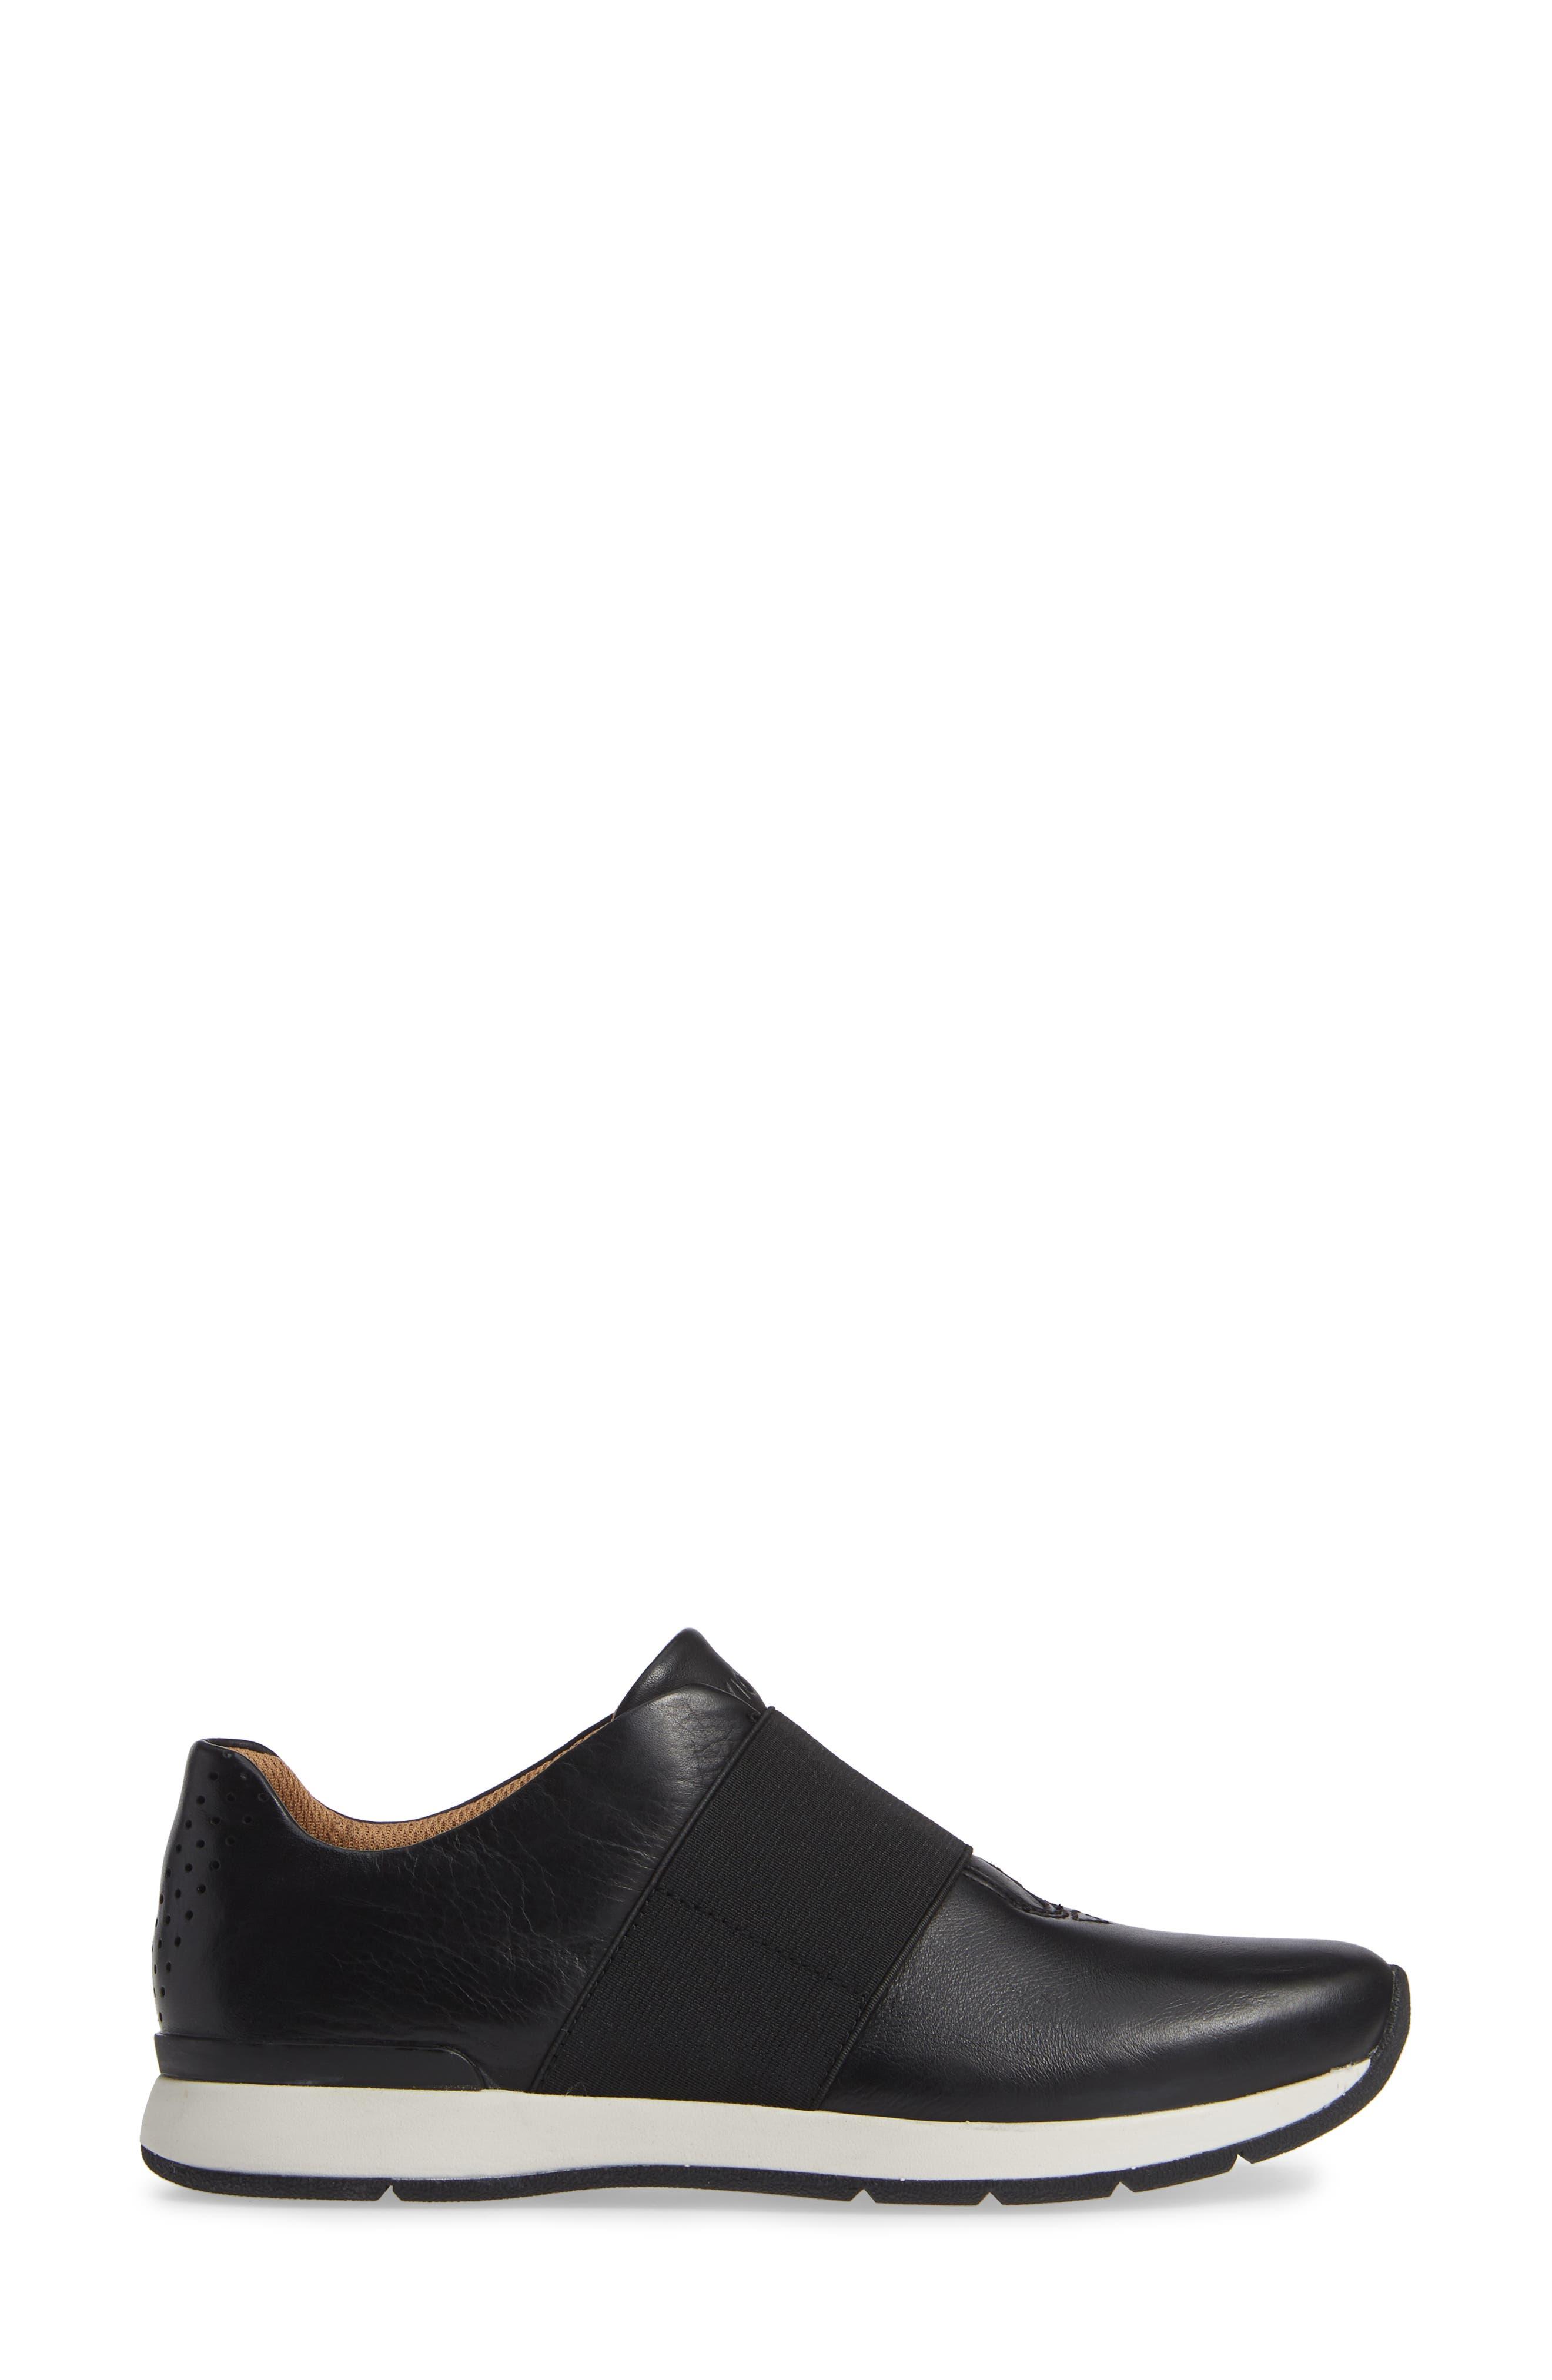 Codie Slip-On Sneaker,                             Alternate thumbnail 3, color,                             BLACK LEATHER